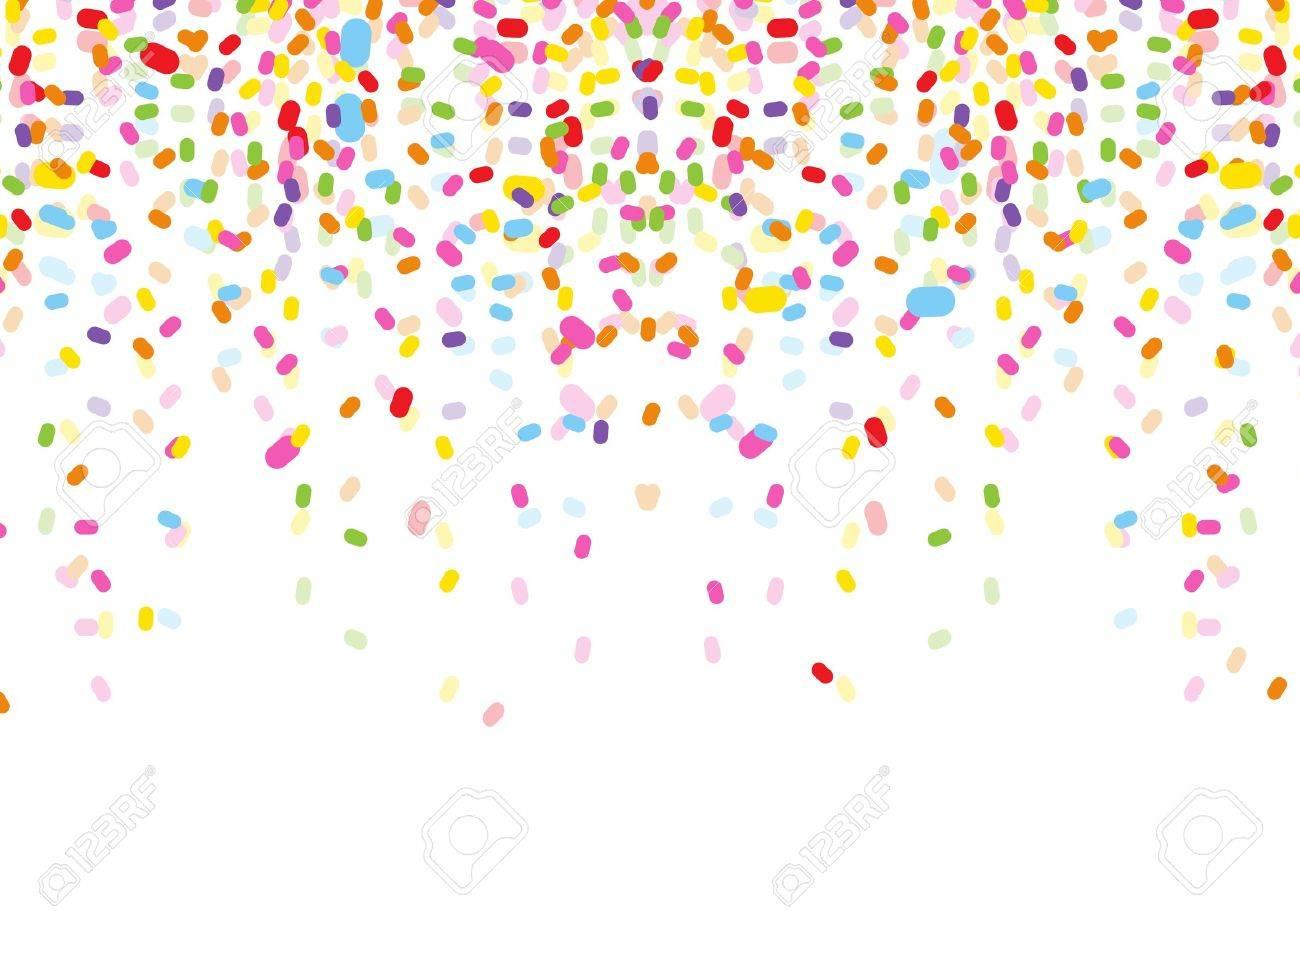 colorful confetti on white background.